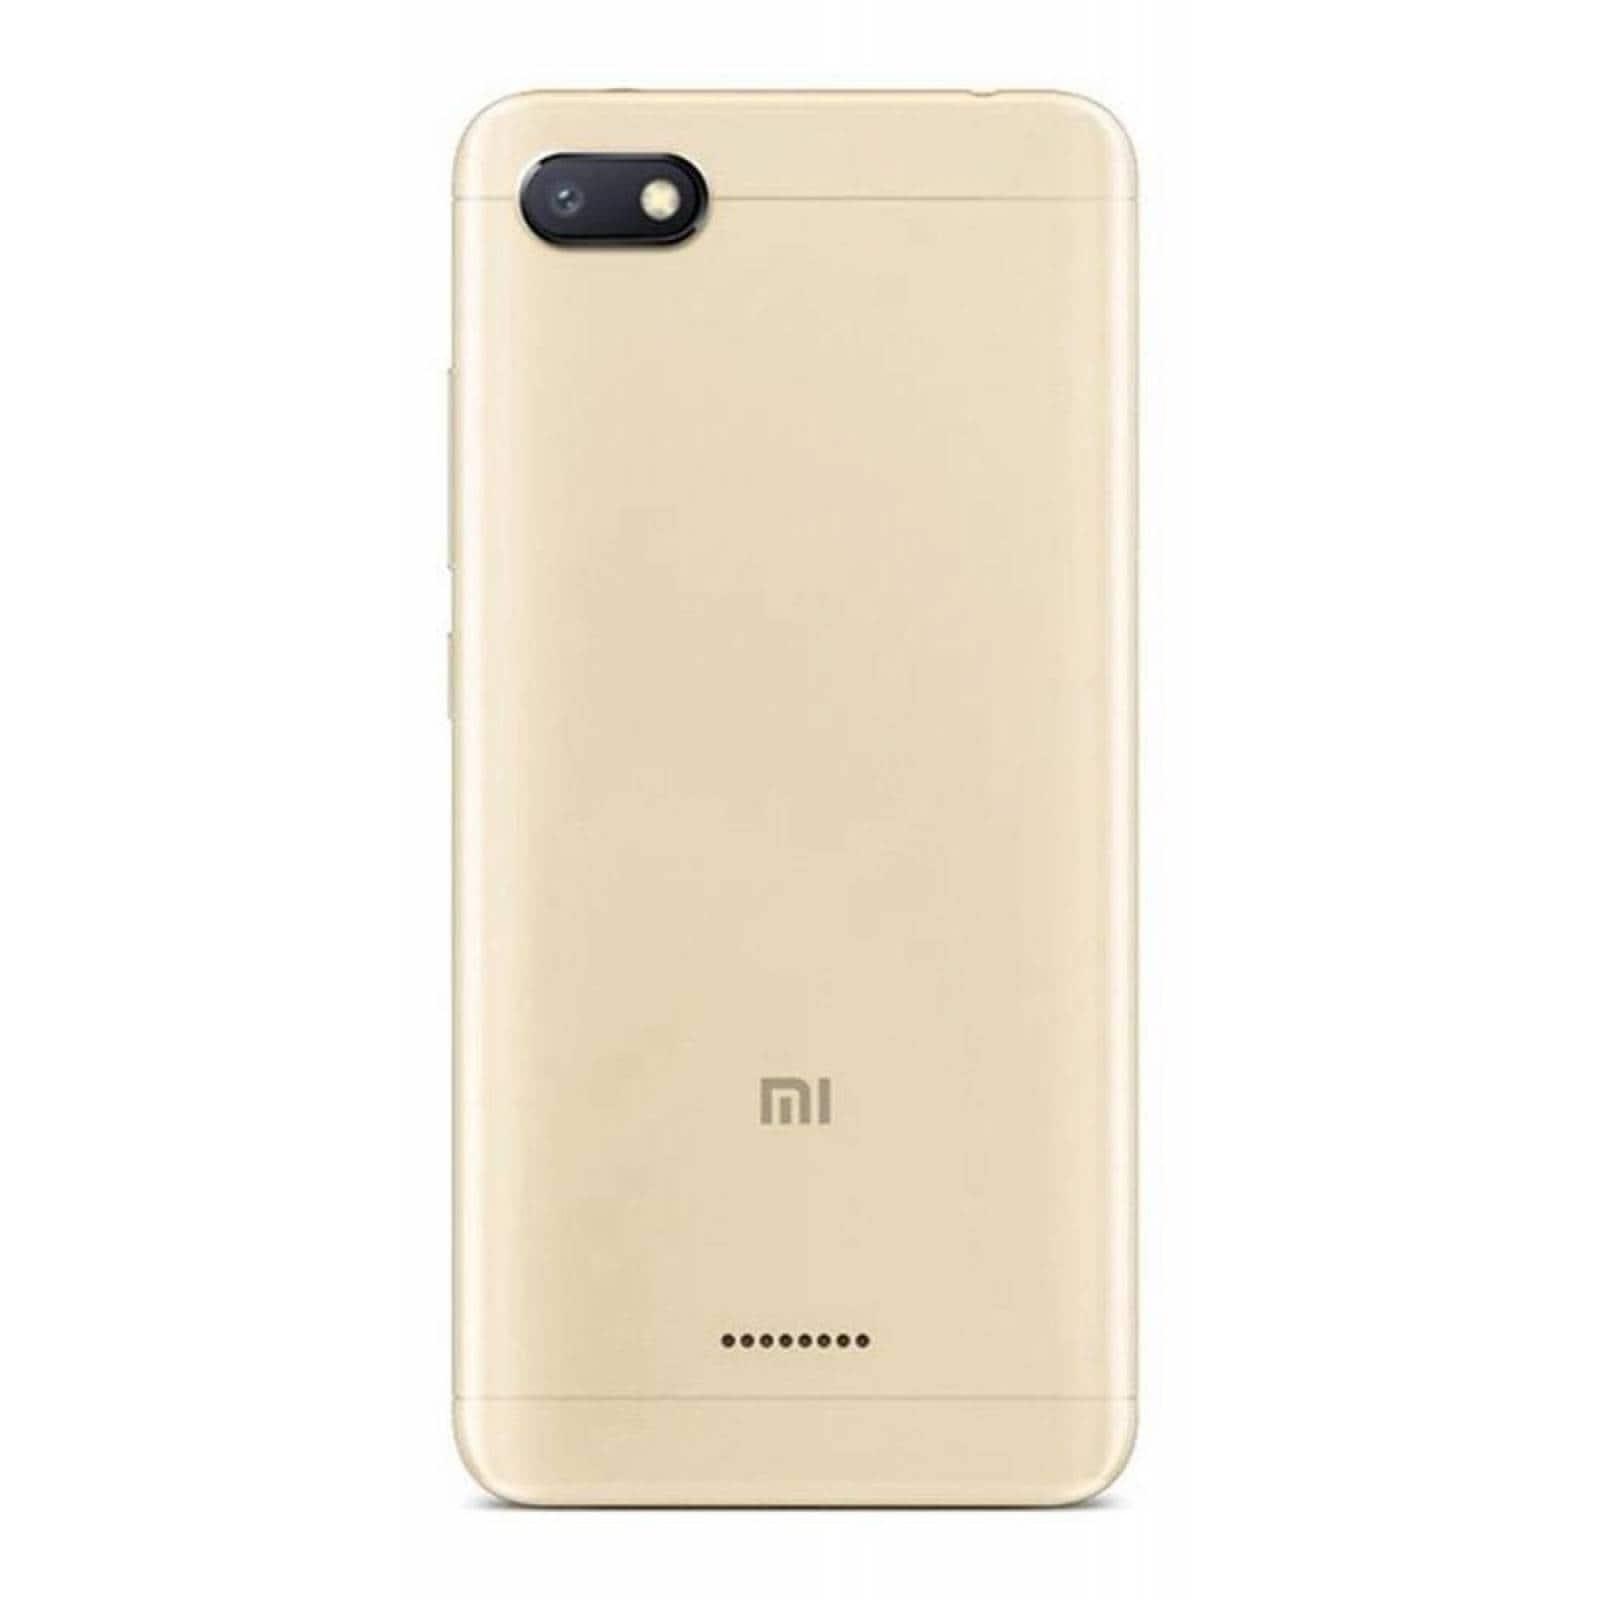 Smartphone Galaxy J4 Plus 16GB Dorado Desbloqueado